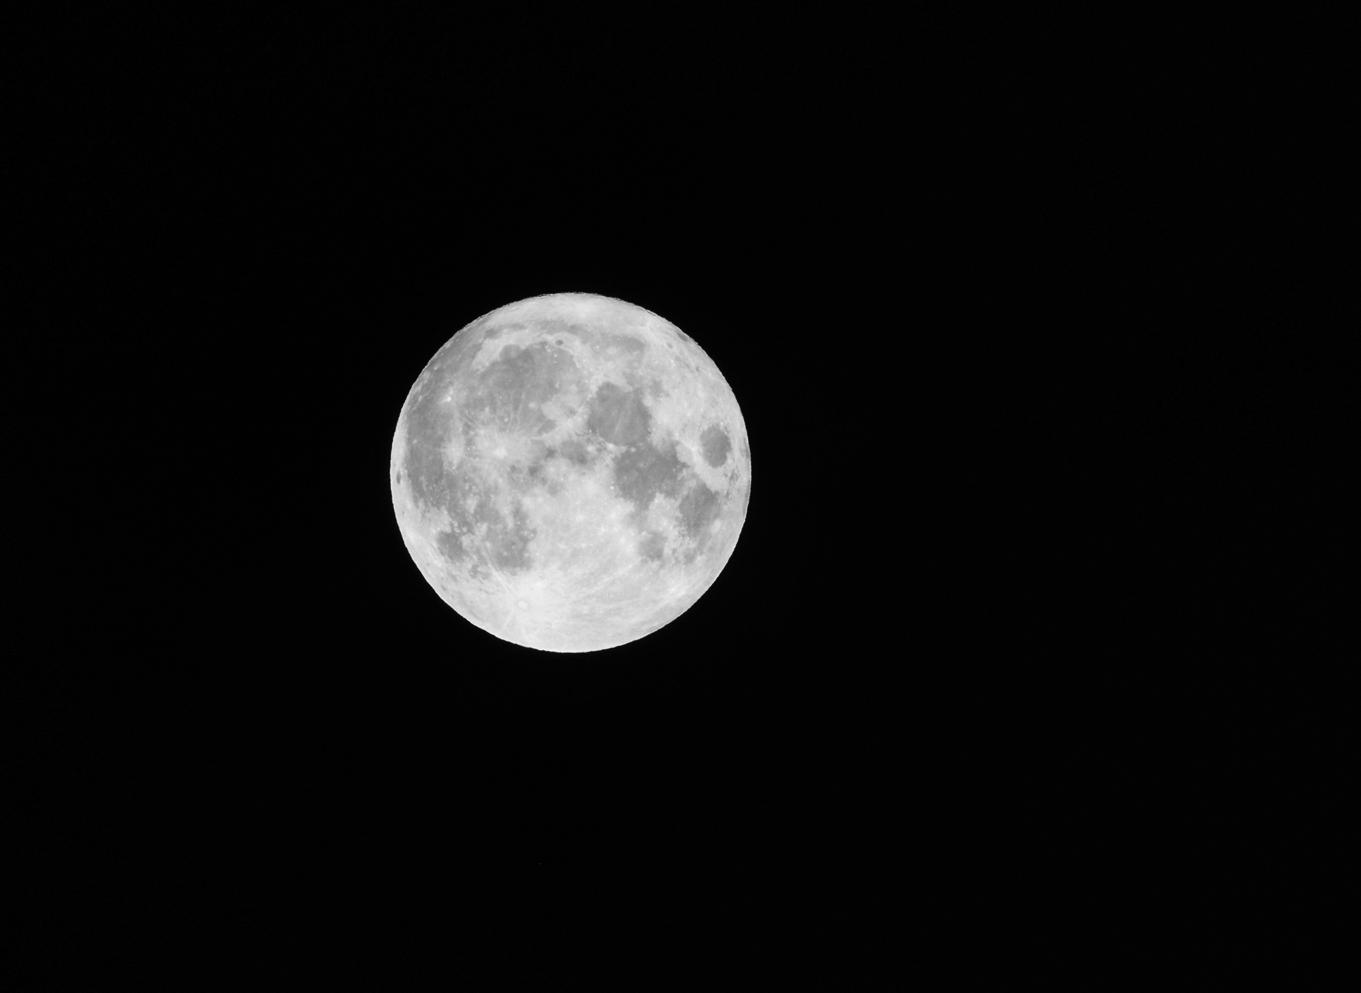 Fullmåne 1L shv DSC_1768